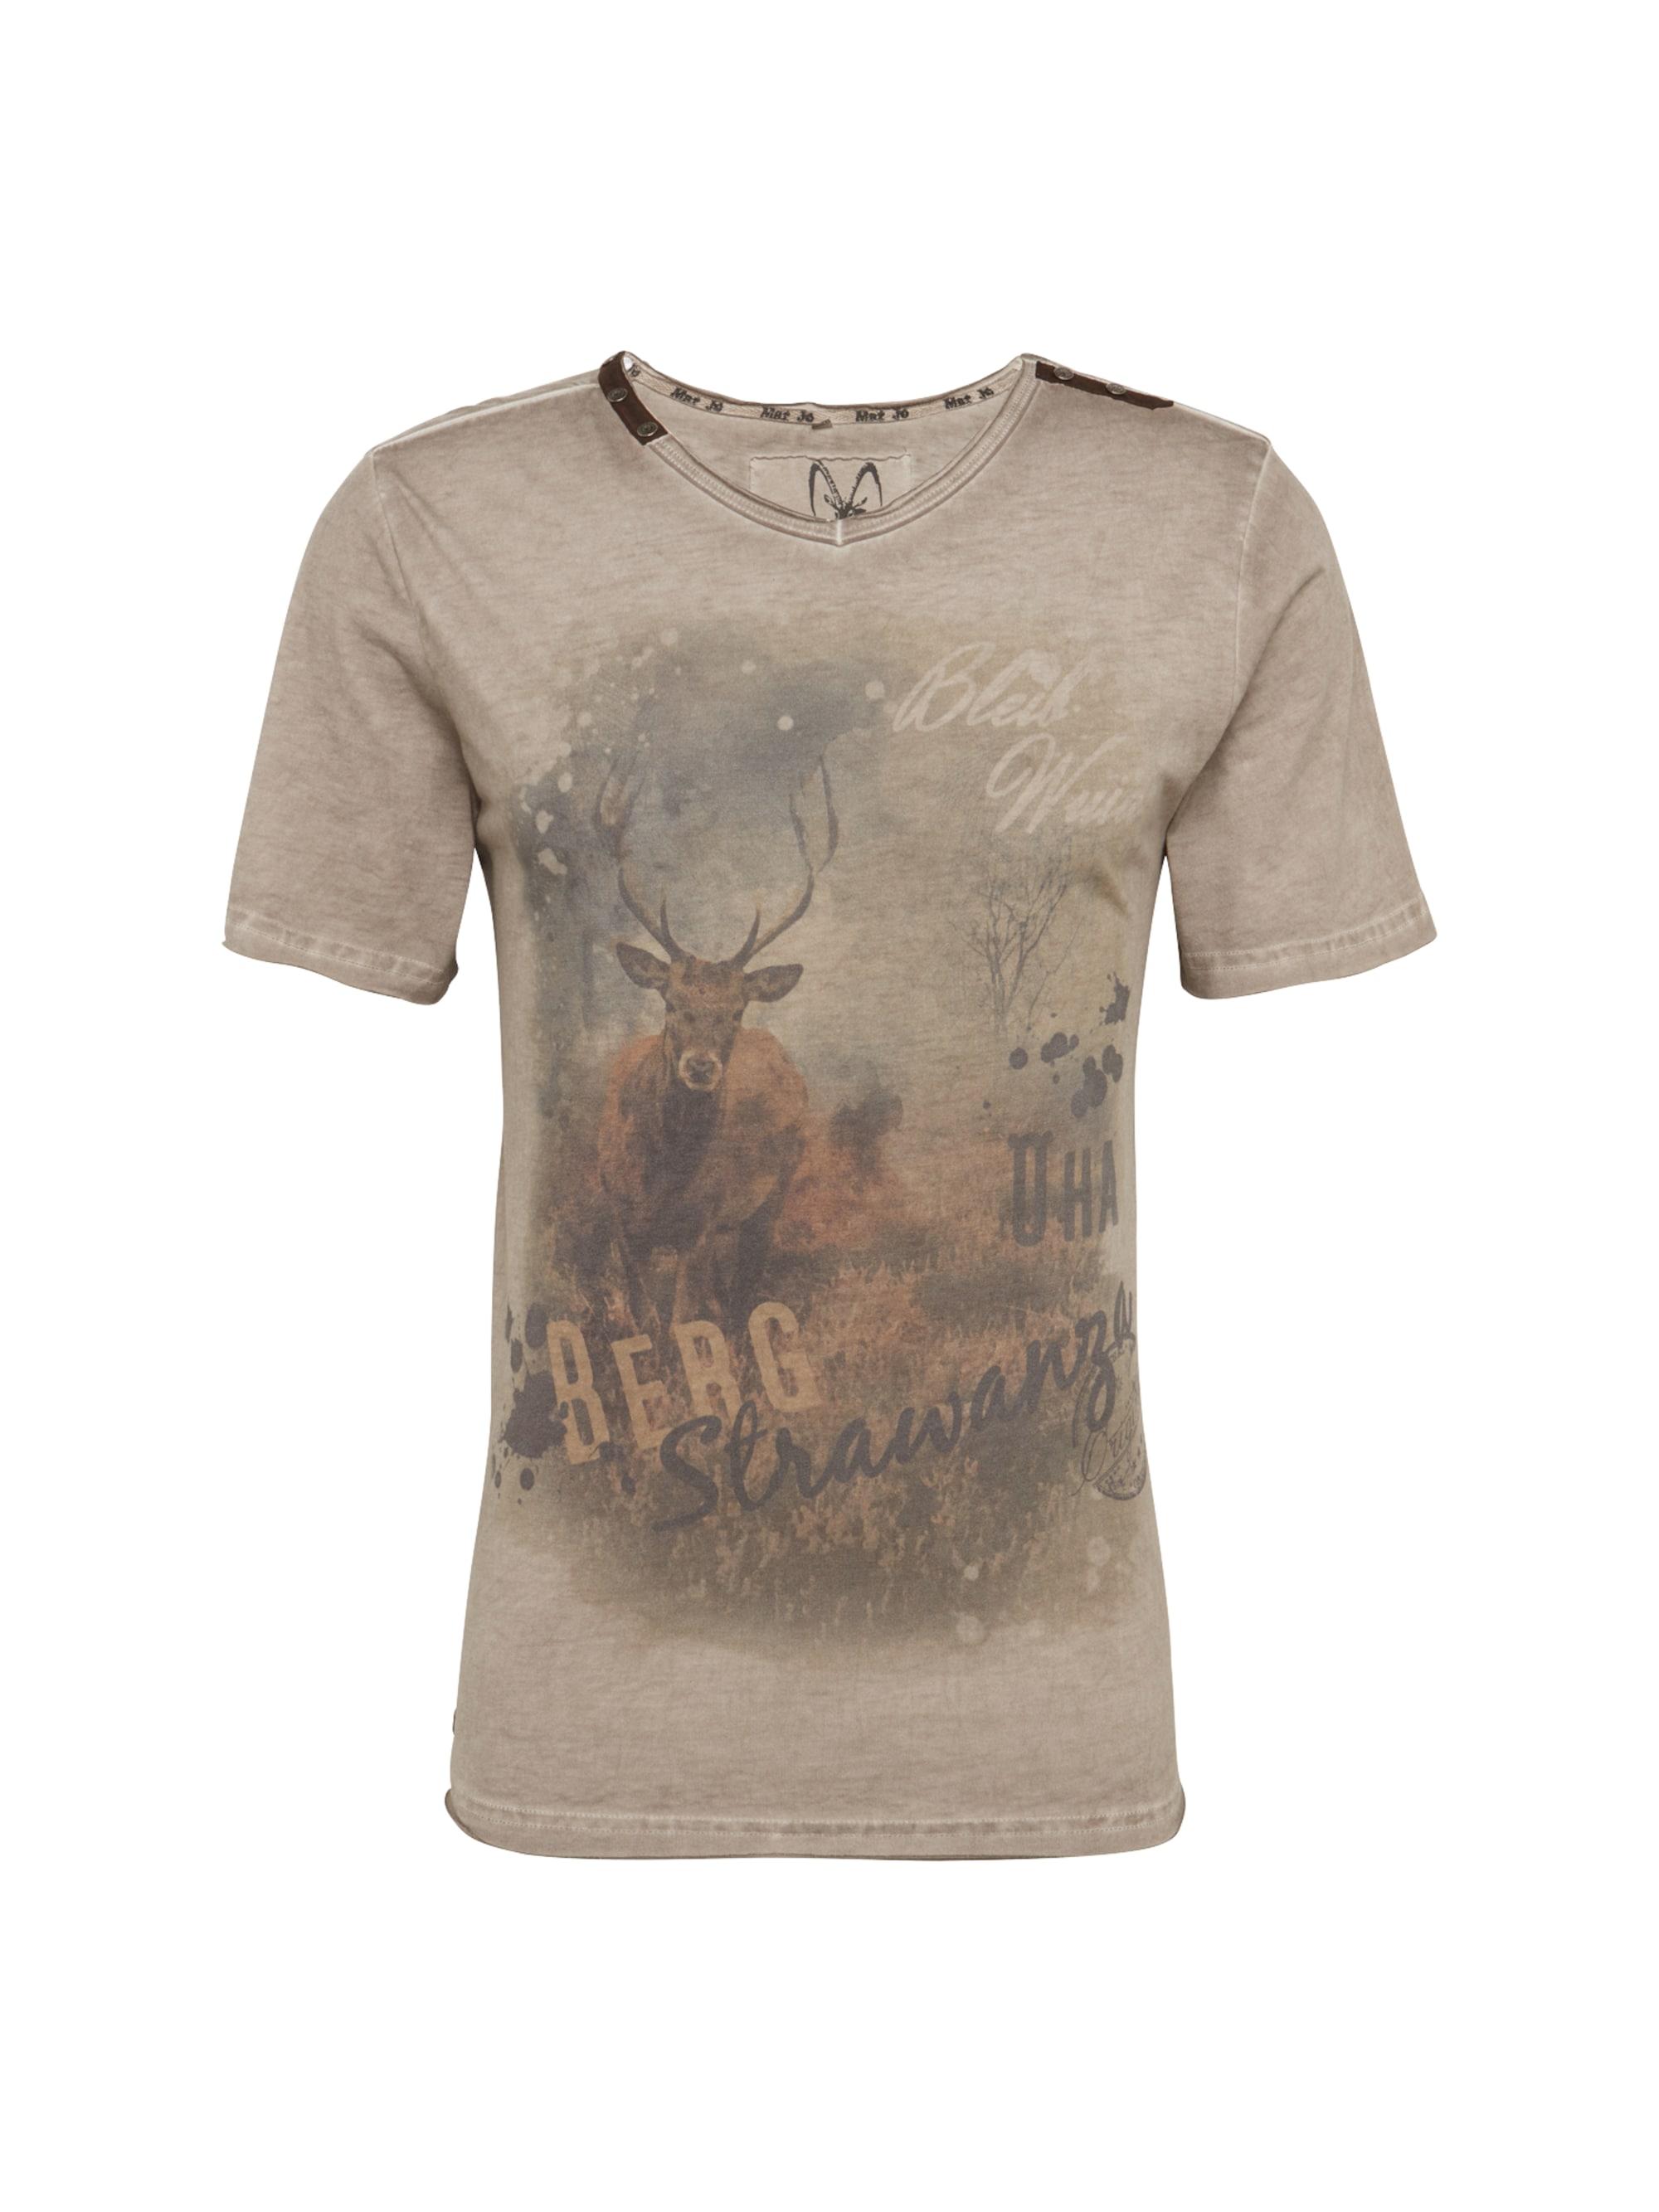 marjo - T-Shirt ´M69 Bergstrawanza Shirt´